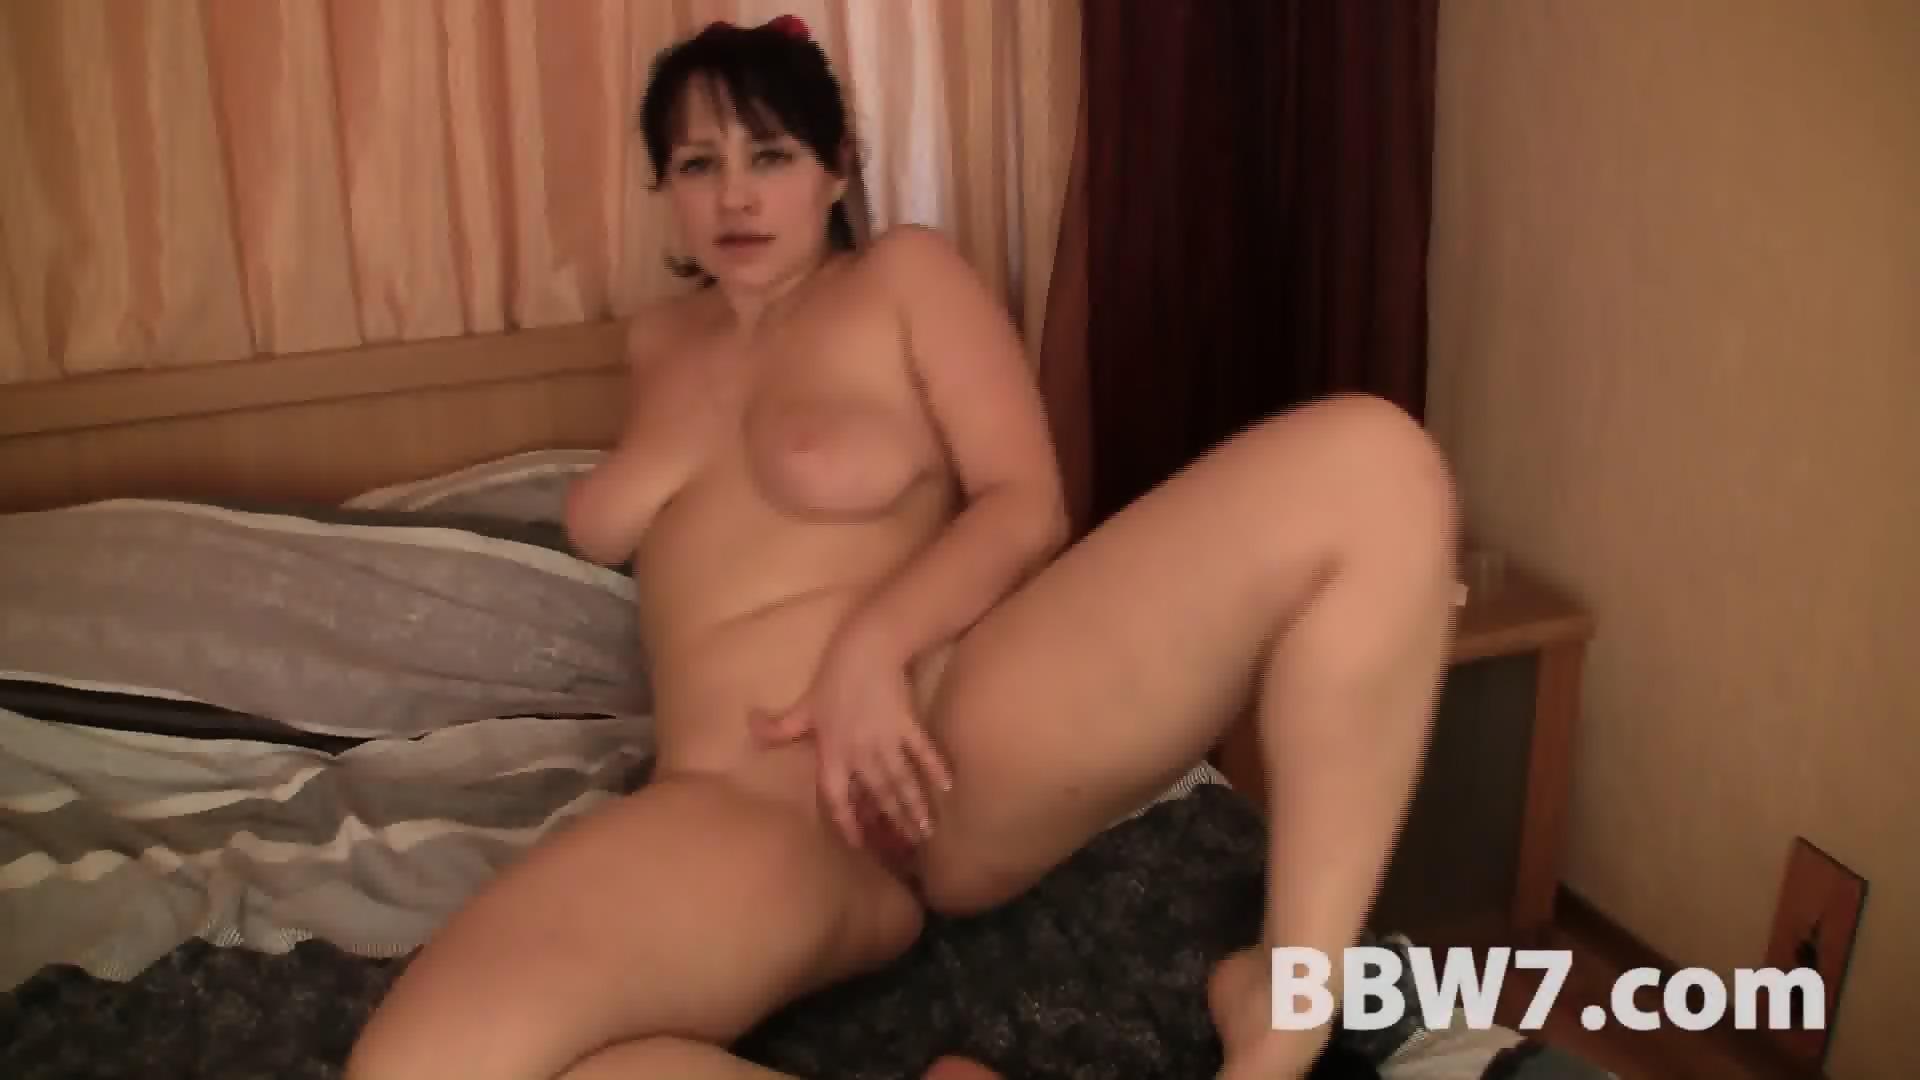 20yo chubby babe masturbating and creaming 8